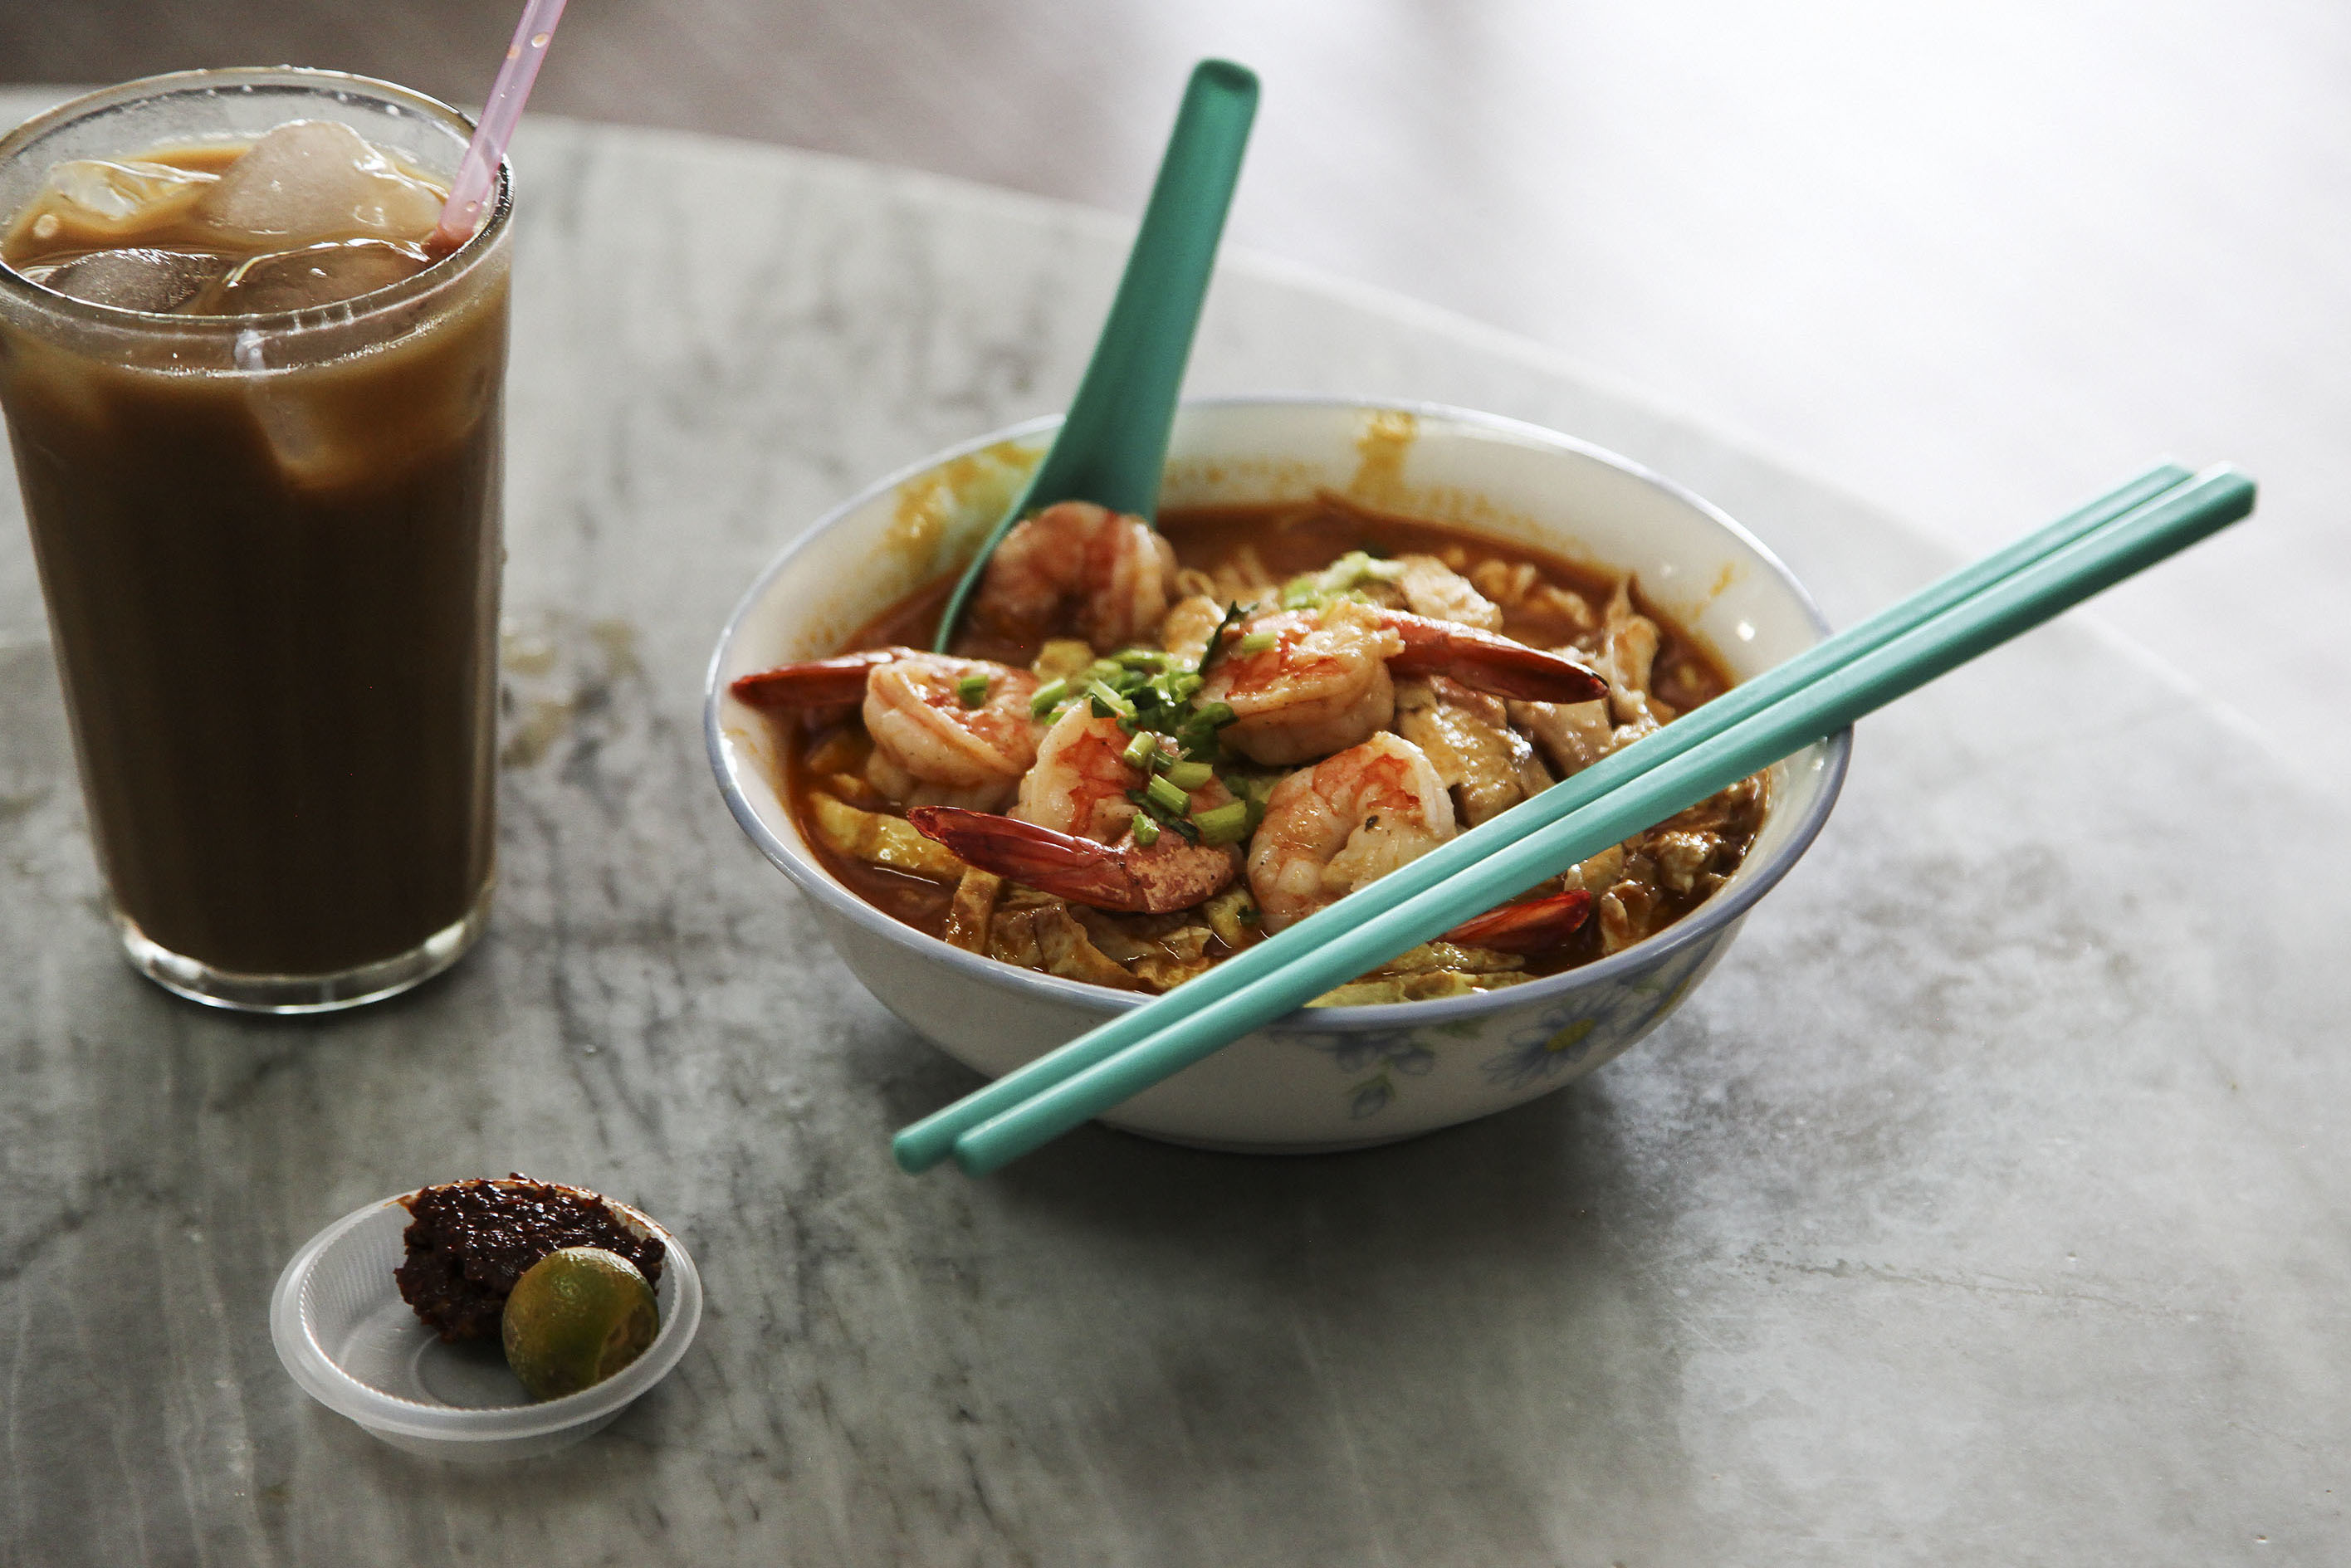 Bourdain eating Sarawak laksa at Choon Hui Cafe.